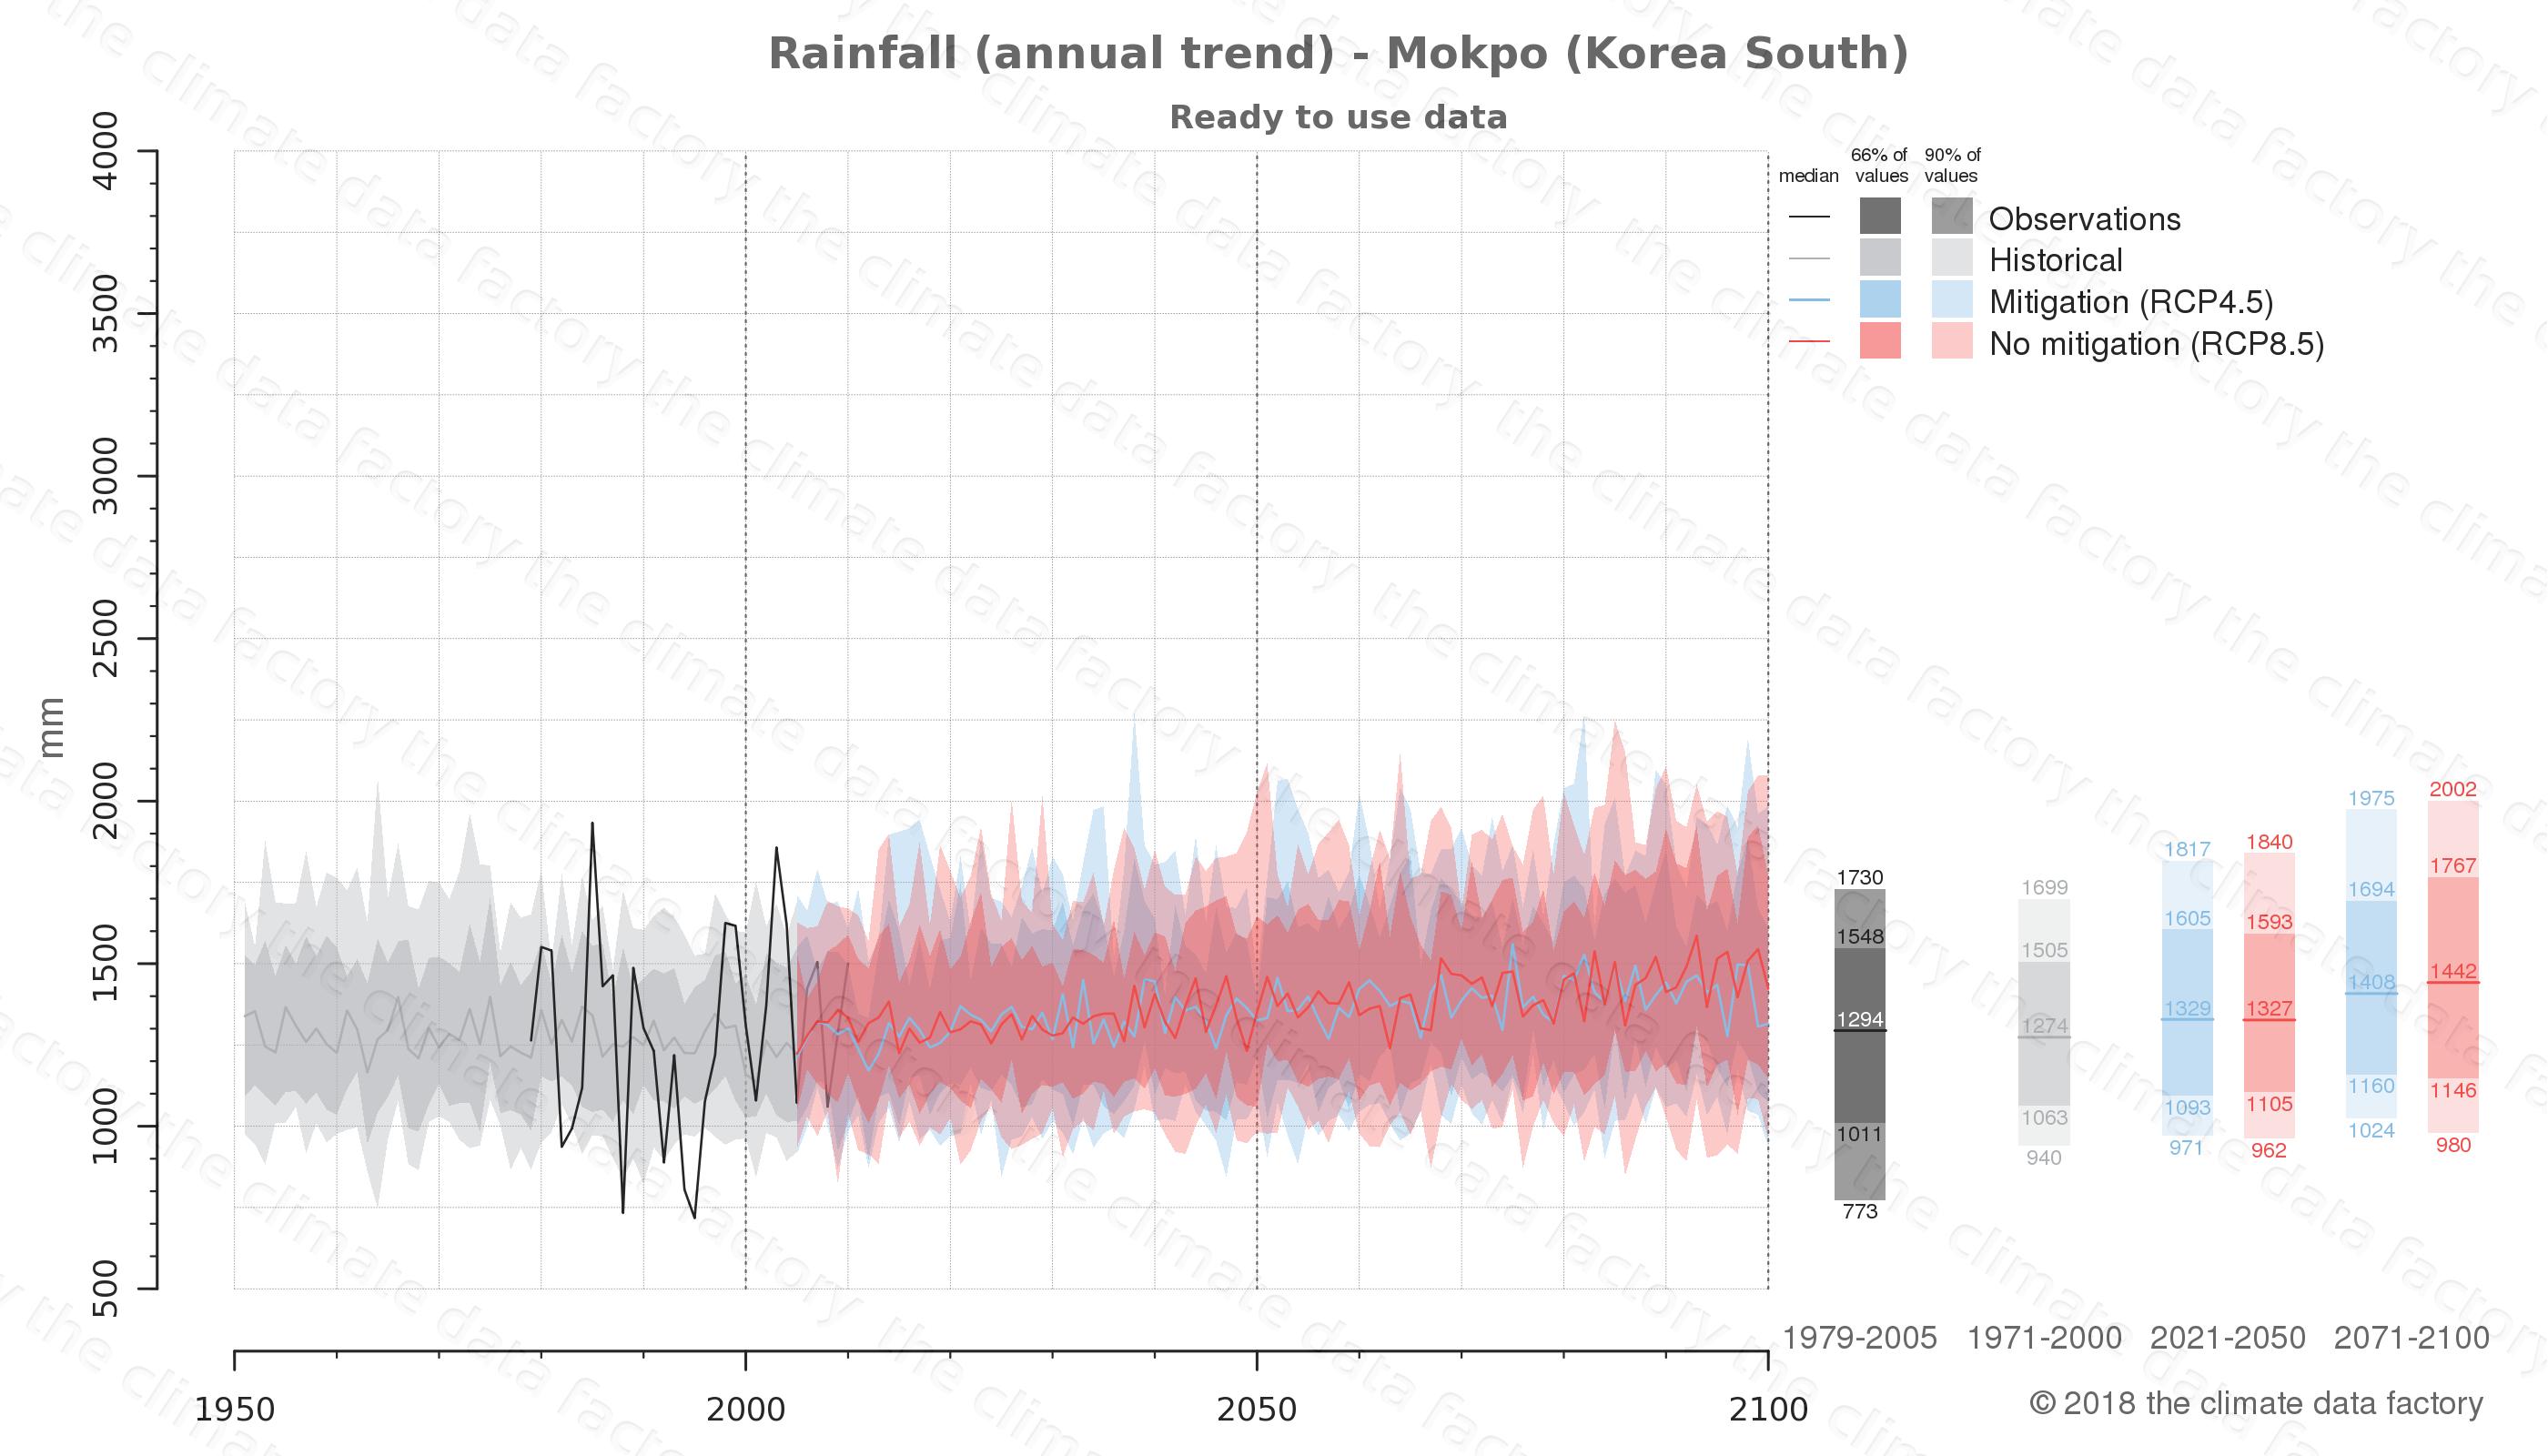 climate change data policy adaptation climate graph city data rainfall mokpo south korea